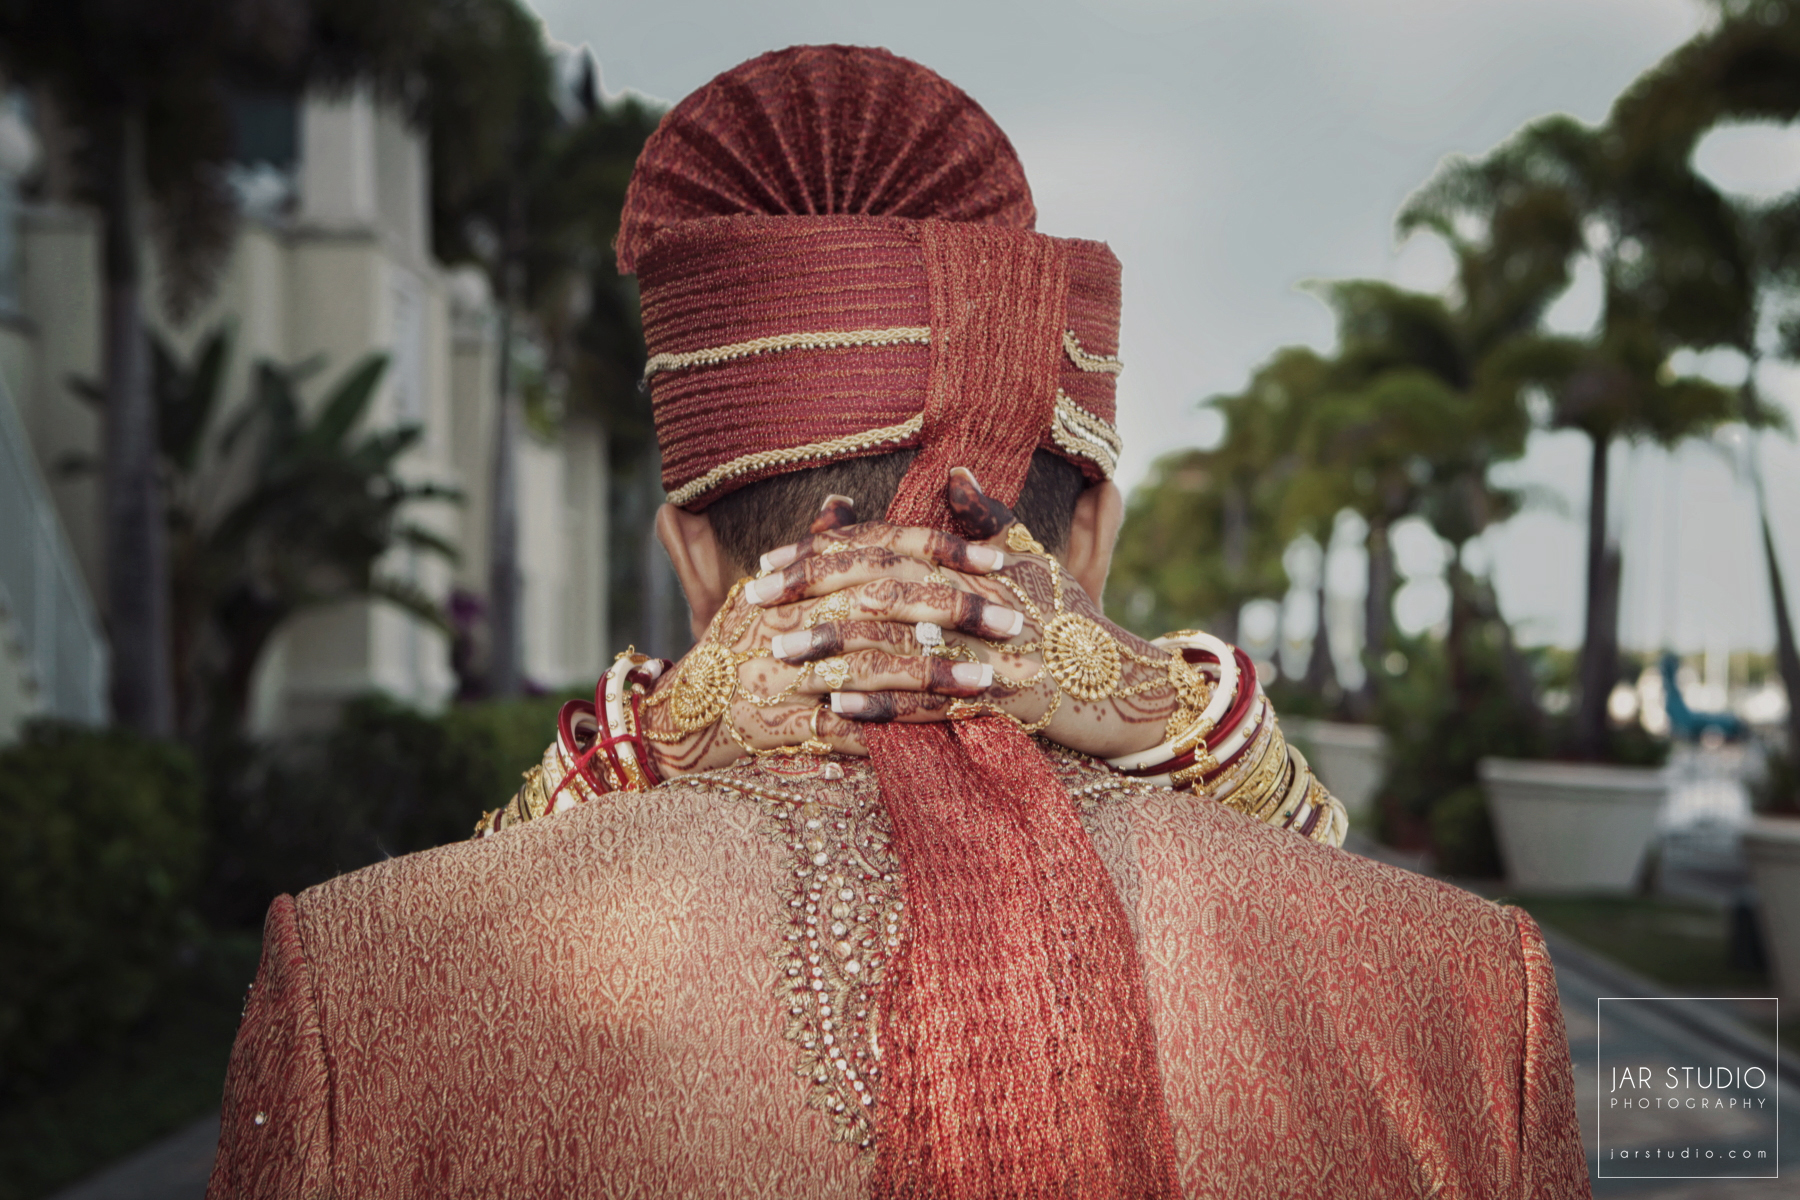 21-groom-Sherwani-mendhi-jarstudio-photography-orlando-sf.JPG